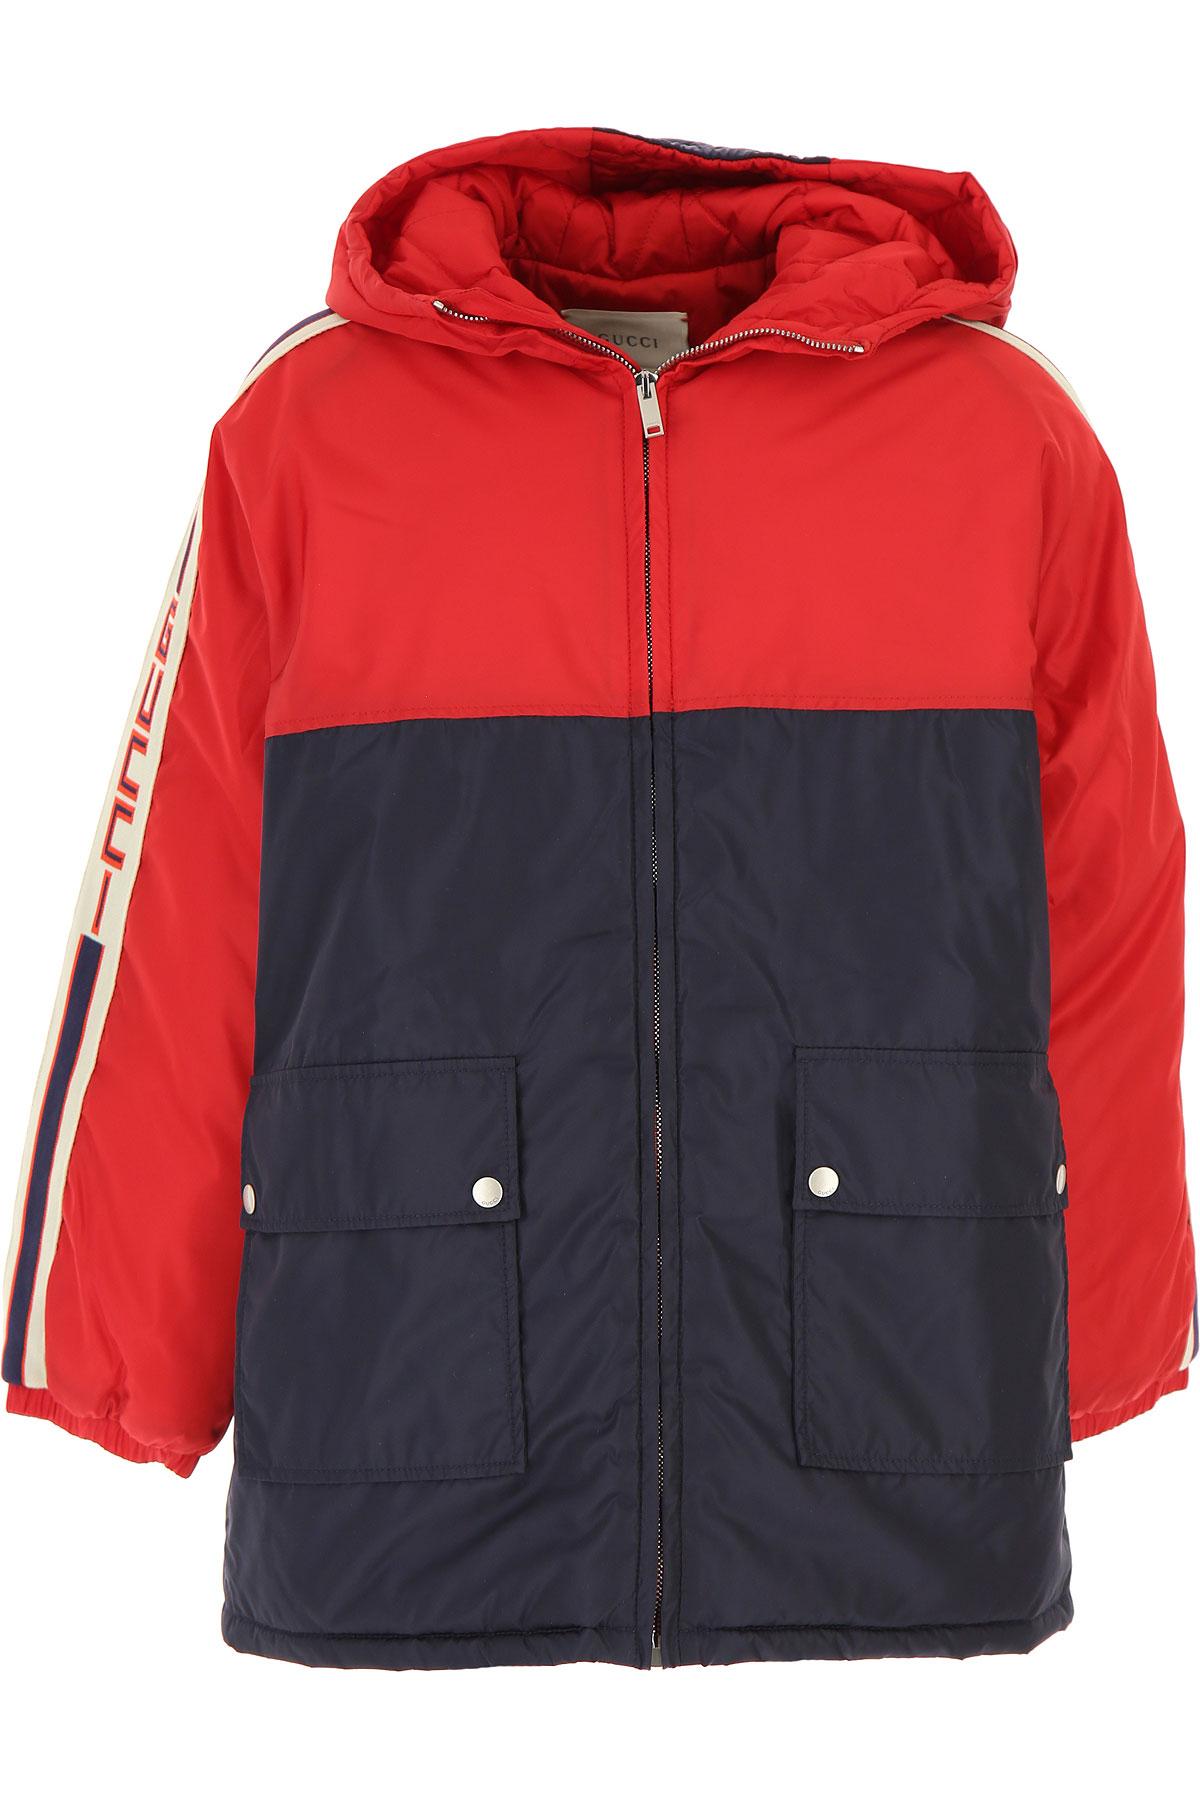 Gucci Boys Down Jacket for Kids, Puffer Ski Jacket On Sale, navy, polyamide, 2019, 10Y 12Y